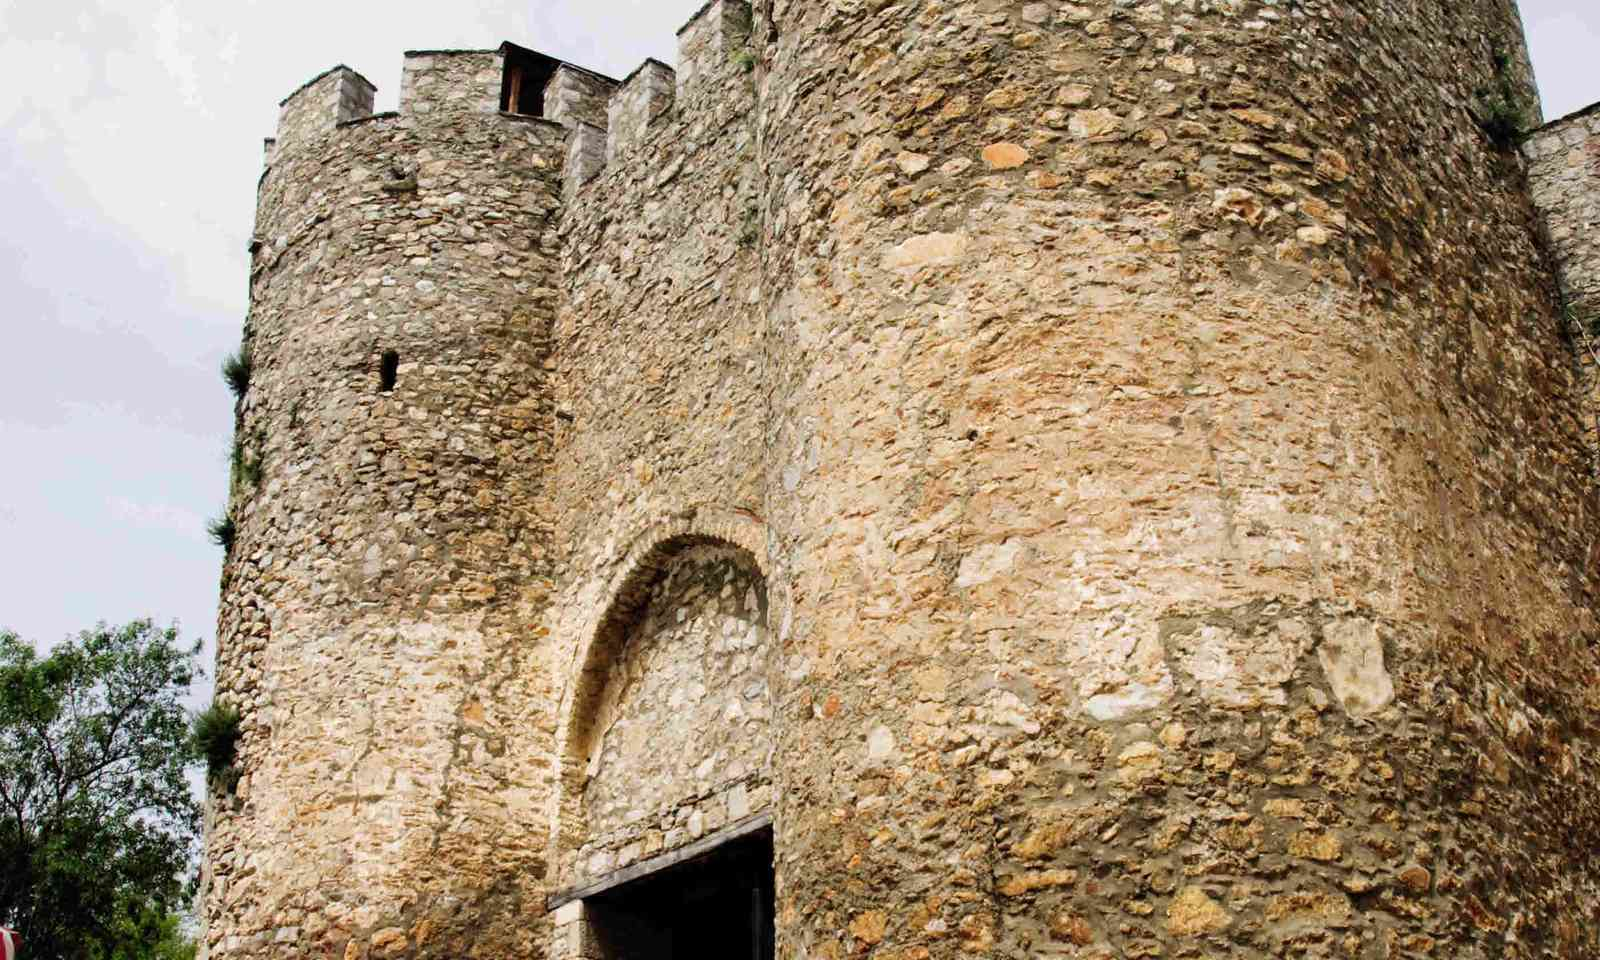 Tsar Samoil's Fortress (Simon Chubb)